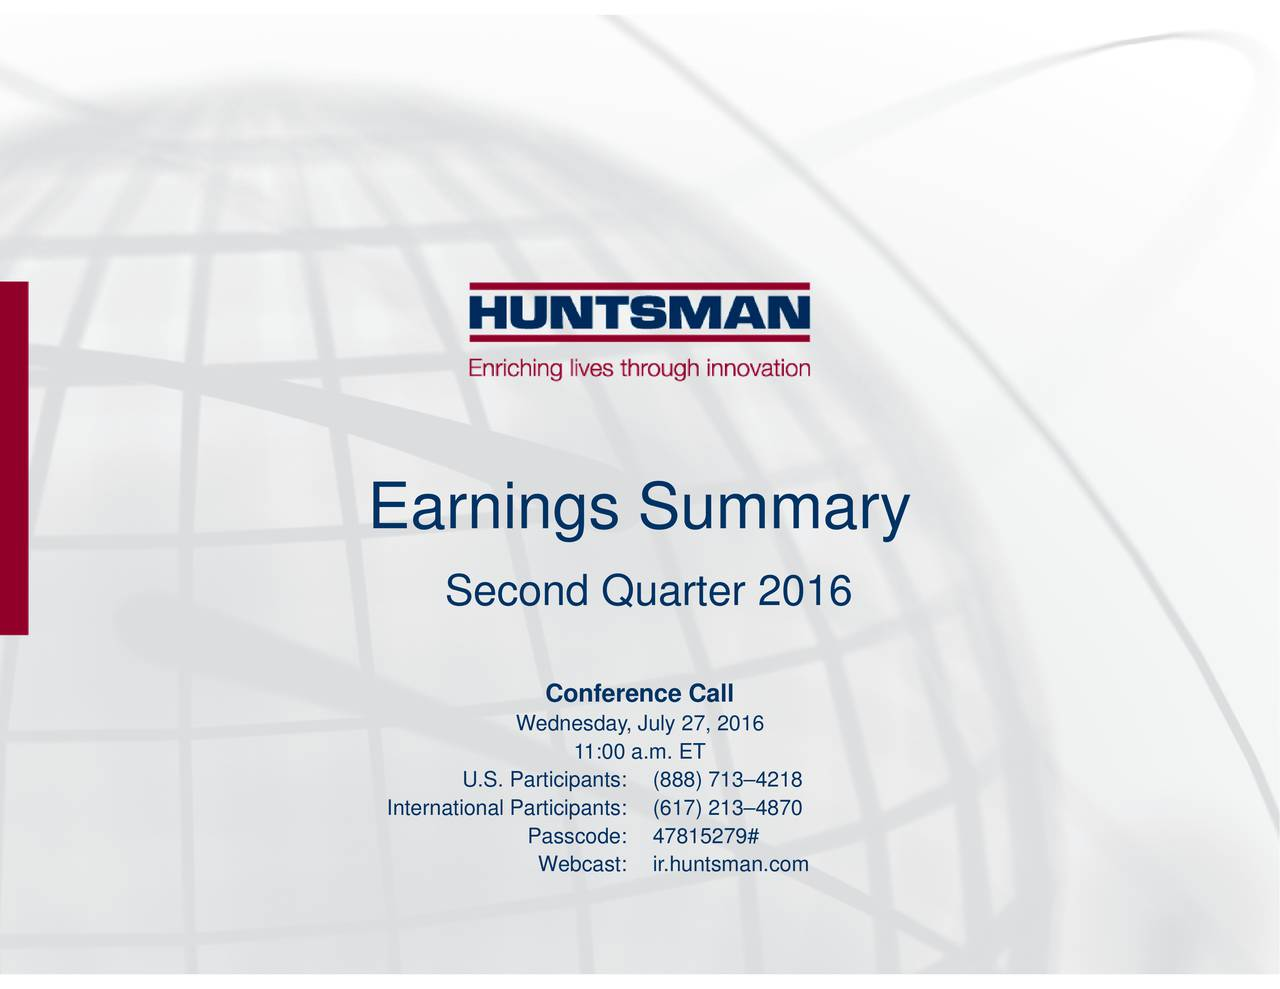 Conference CaWebcast: ir.huntsman.com Wednesday, July 27, 2016279# U.S. Participan(888) 7134218 Second Quarter 2016 International Partici(617) 2134870 Earnings Summary